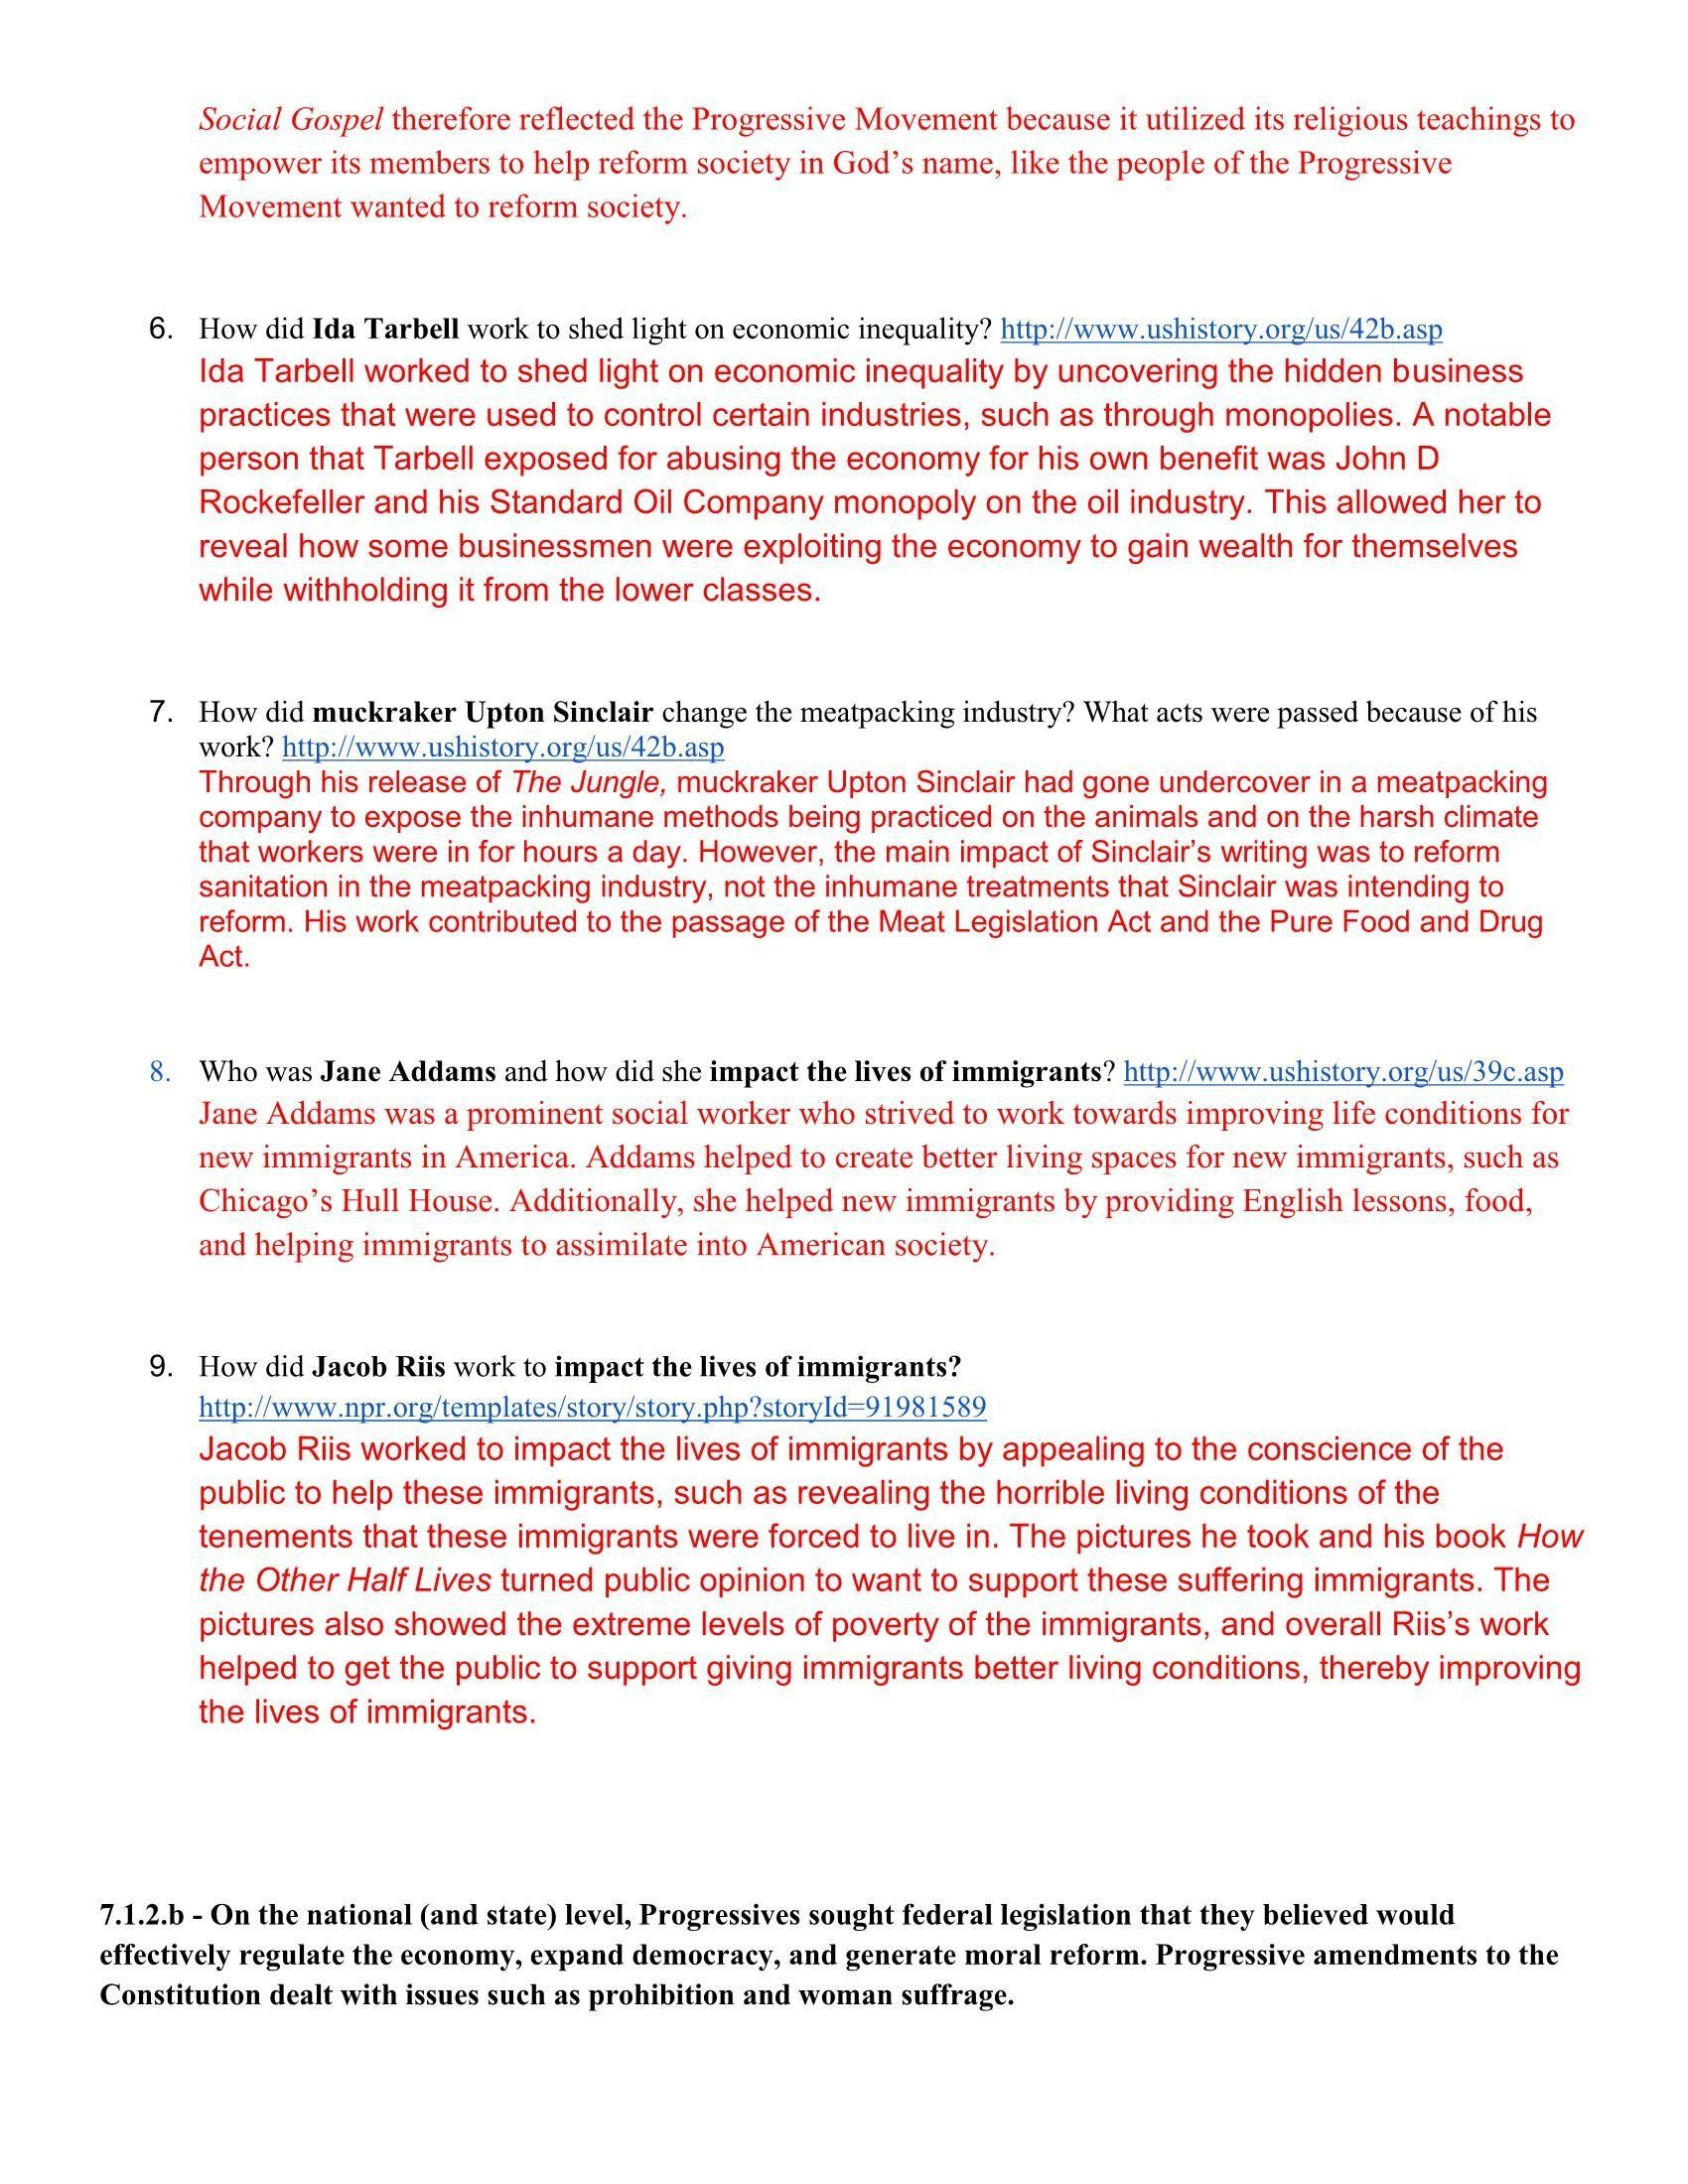 The Progressive Era Worksheet Scavengerhuntrealpdf Pages 1 6 Text Version Reading Comprehension Worksheets Worksheet Template Textbook Scavenger Hunt